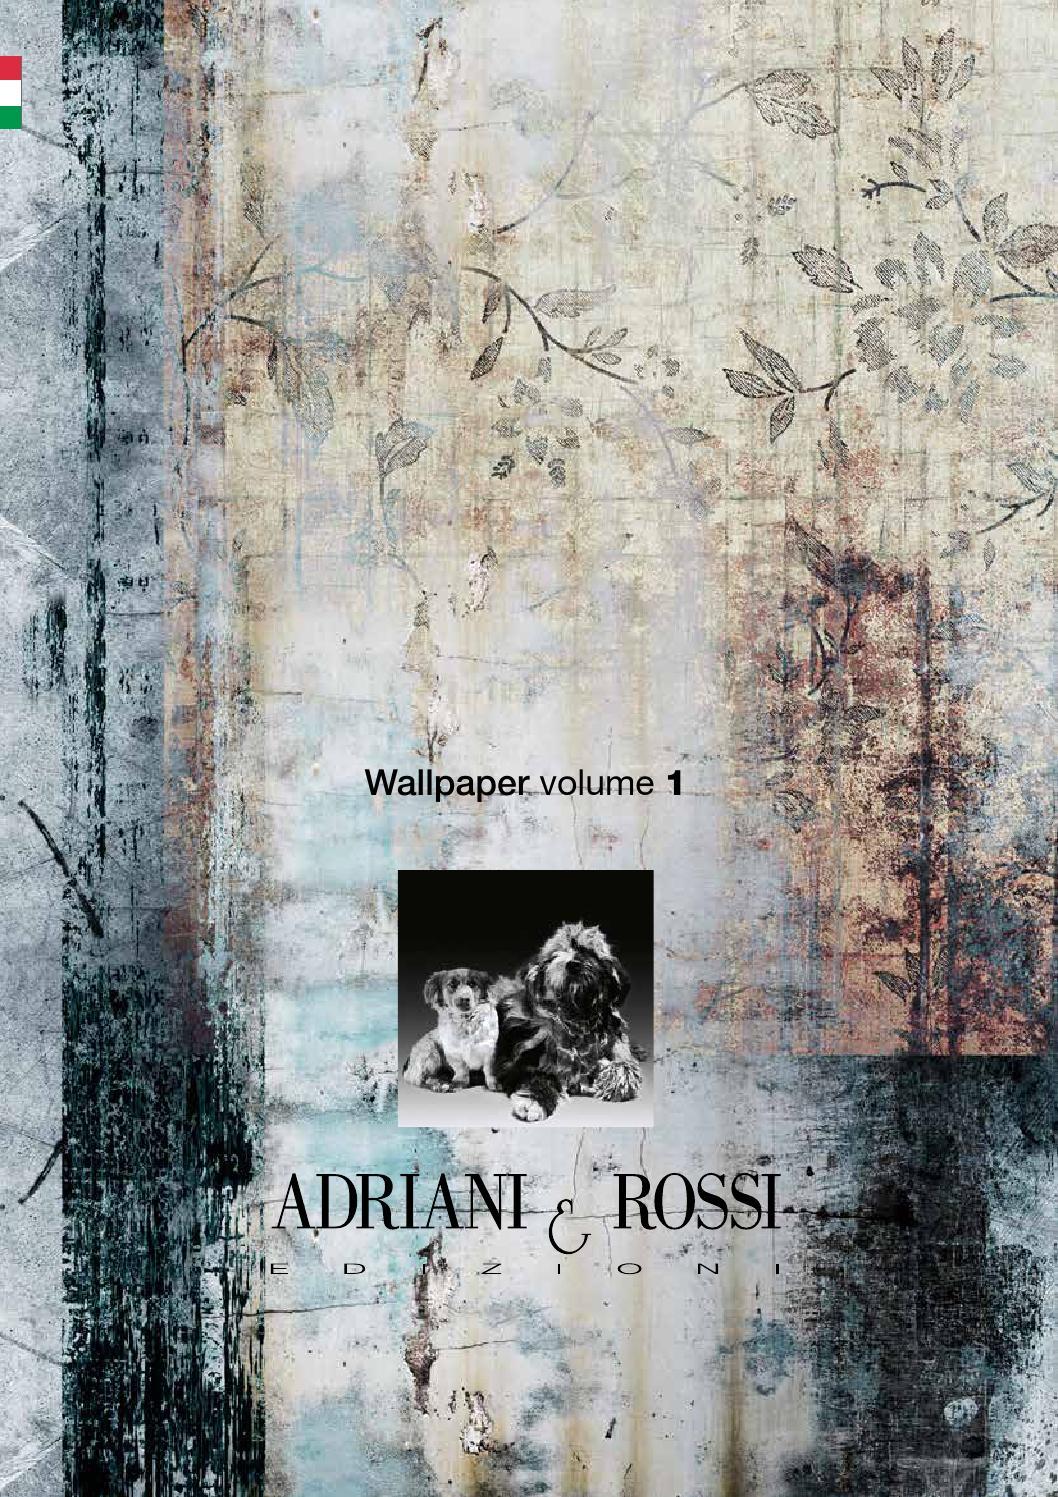 Adriani E Rossi Carta Da Parati wallpaperart-adrian-rossibellacasa.i - issuu